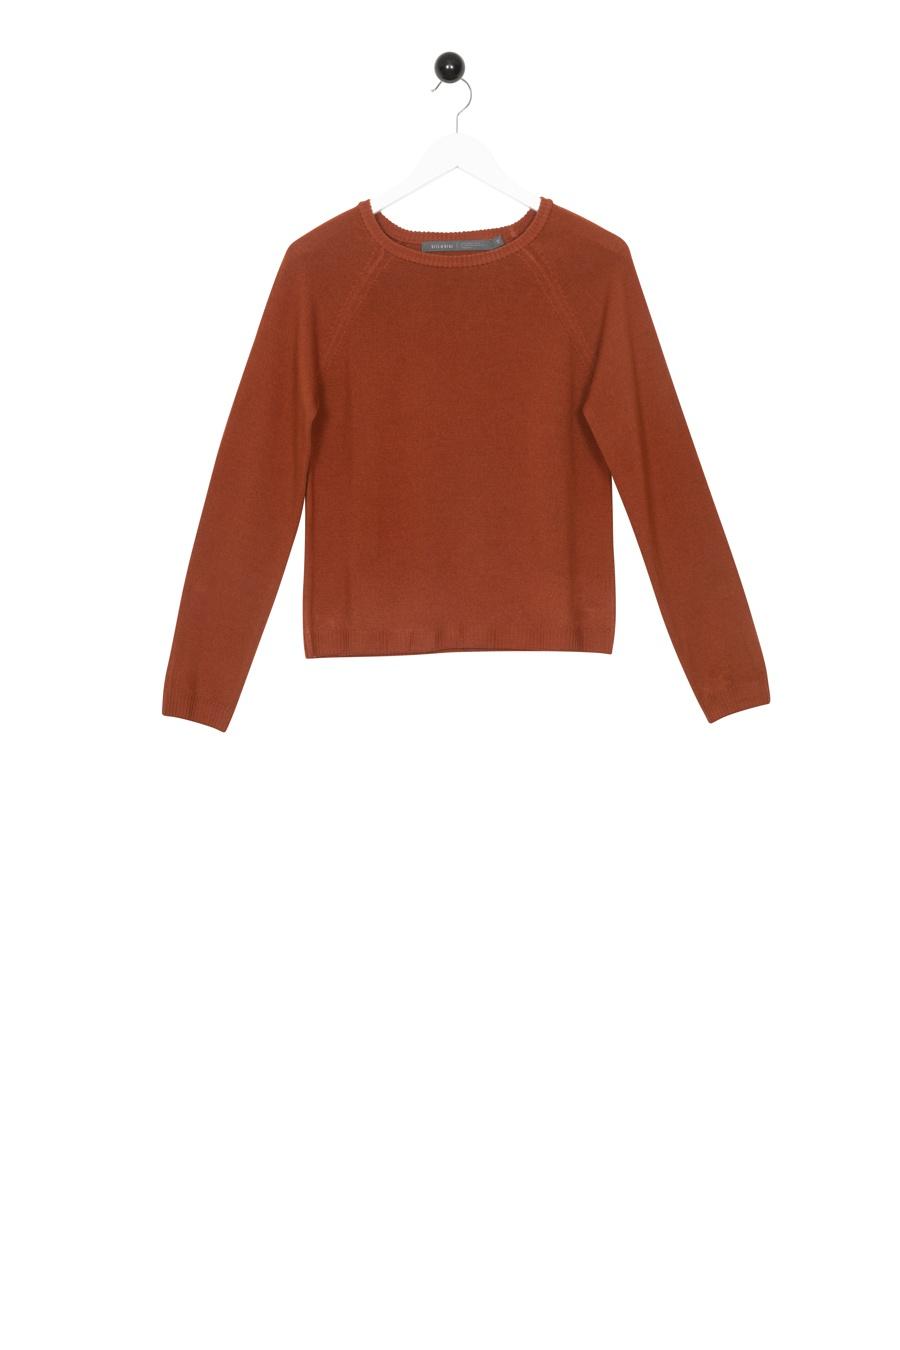 Hagestad Sweater